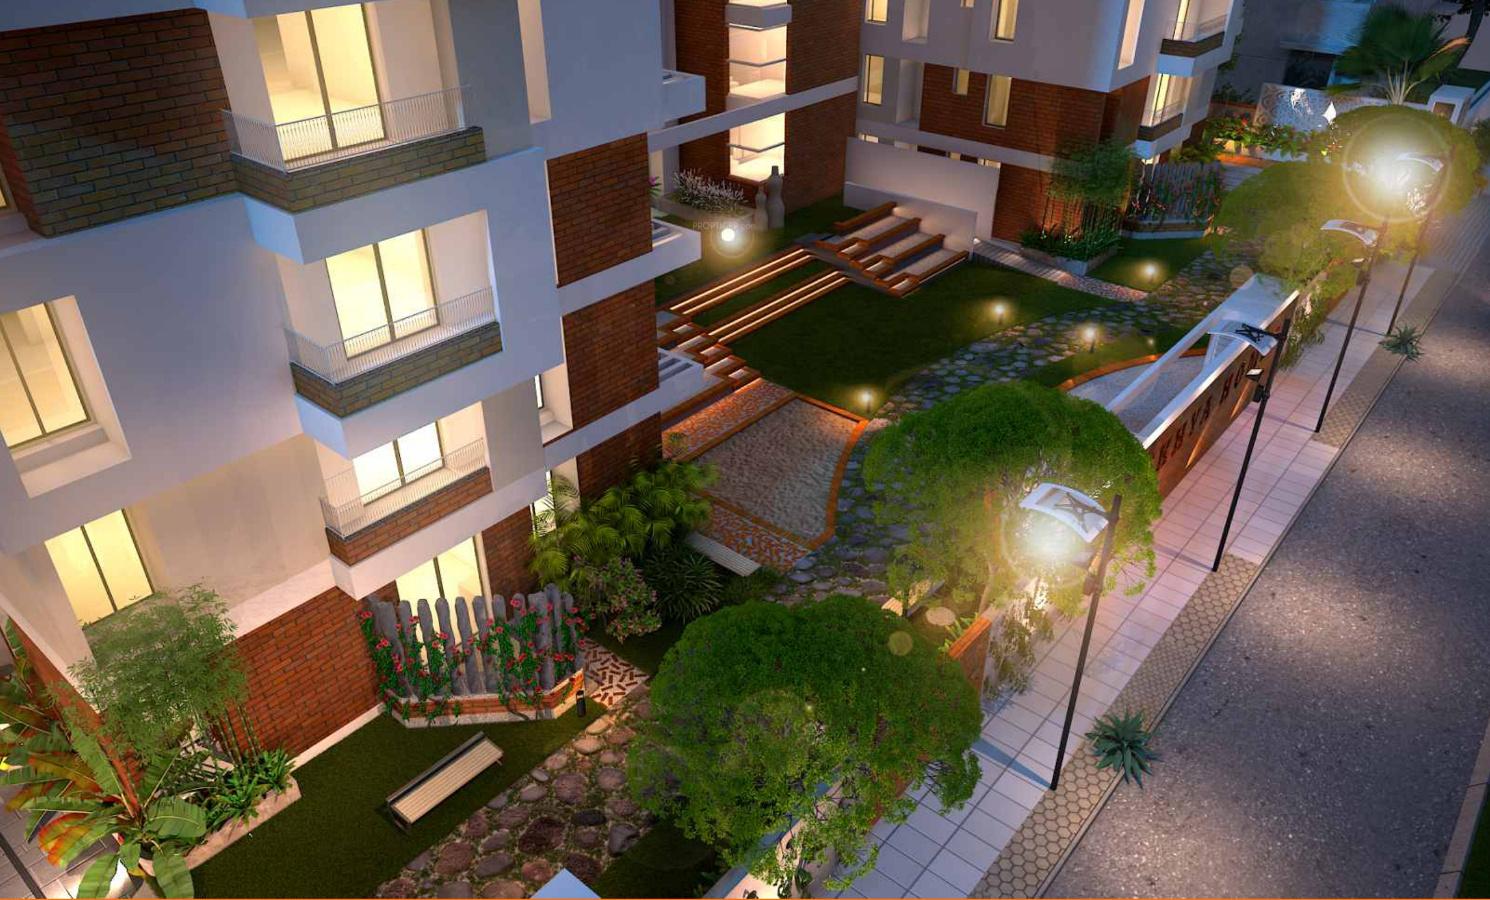 Main Elevation Image 4 of alekhya homes Wind Chimes Unit available